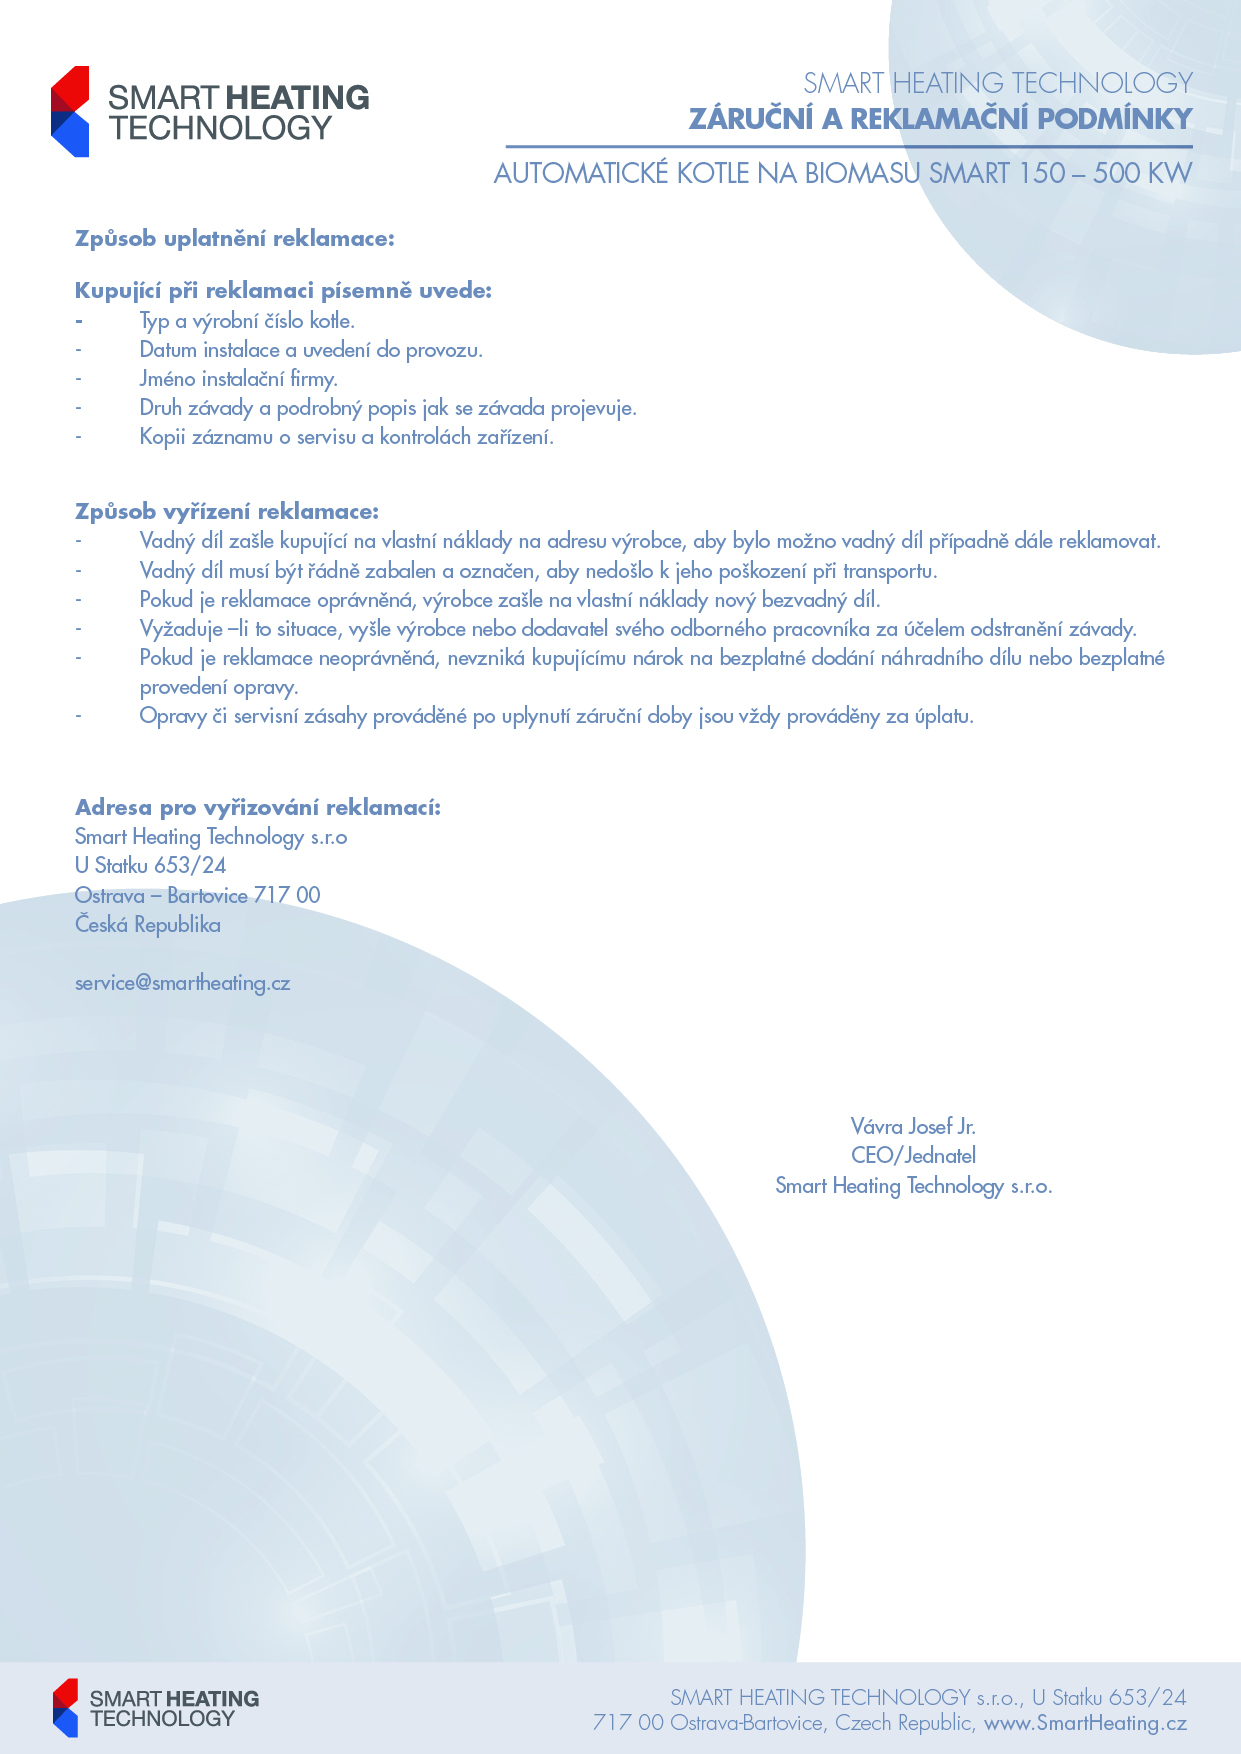 Zarucni_a_reklamacni_podminky_smart_150-500kW2